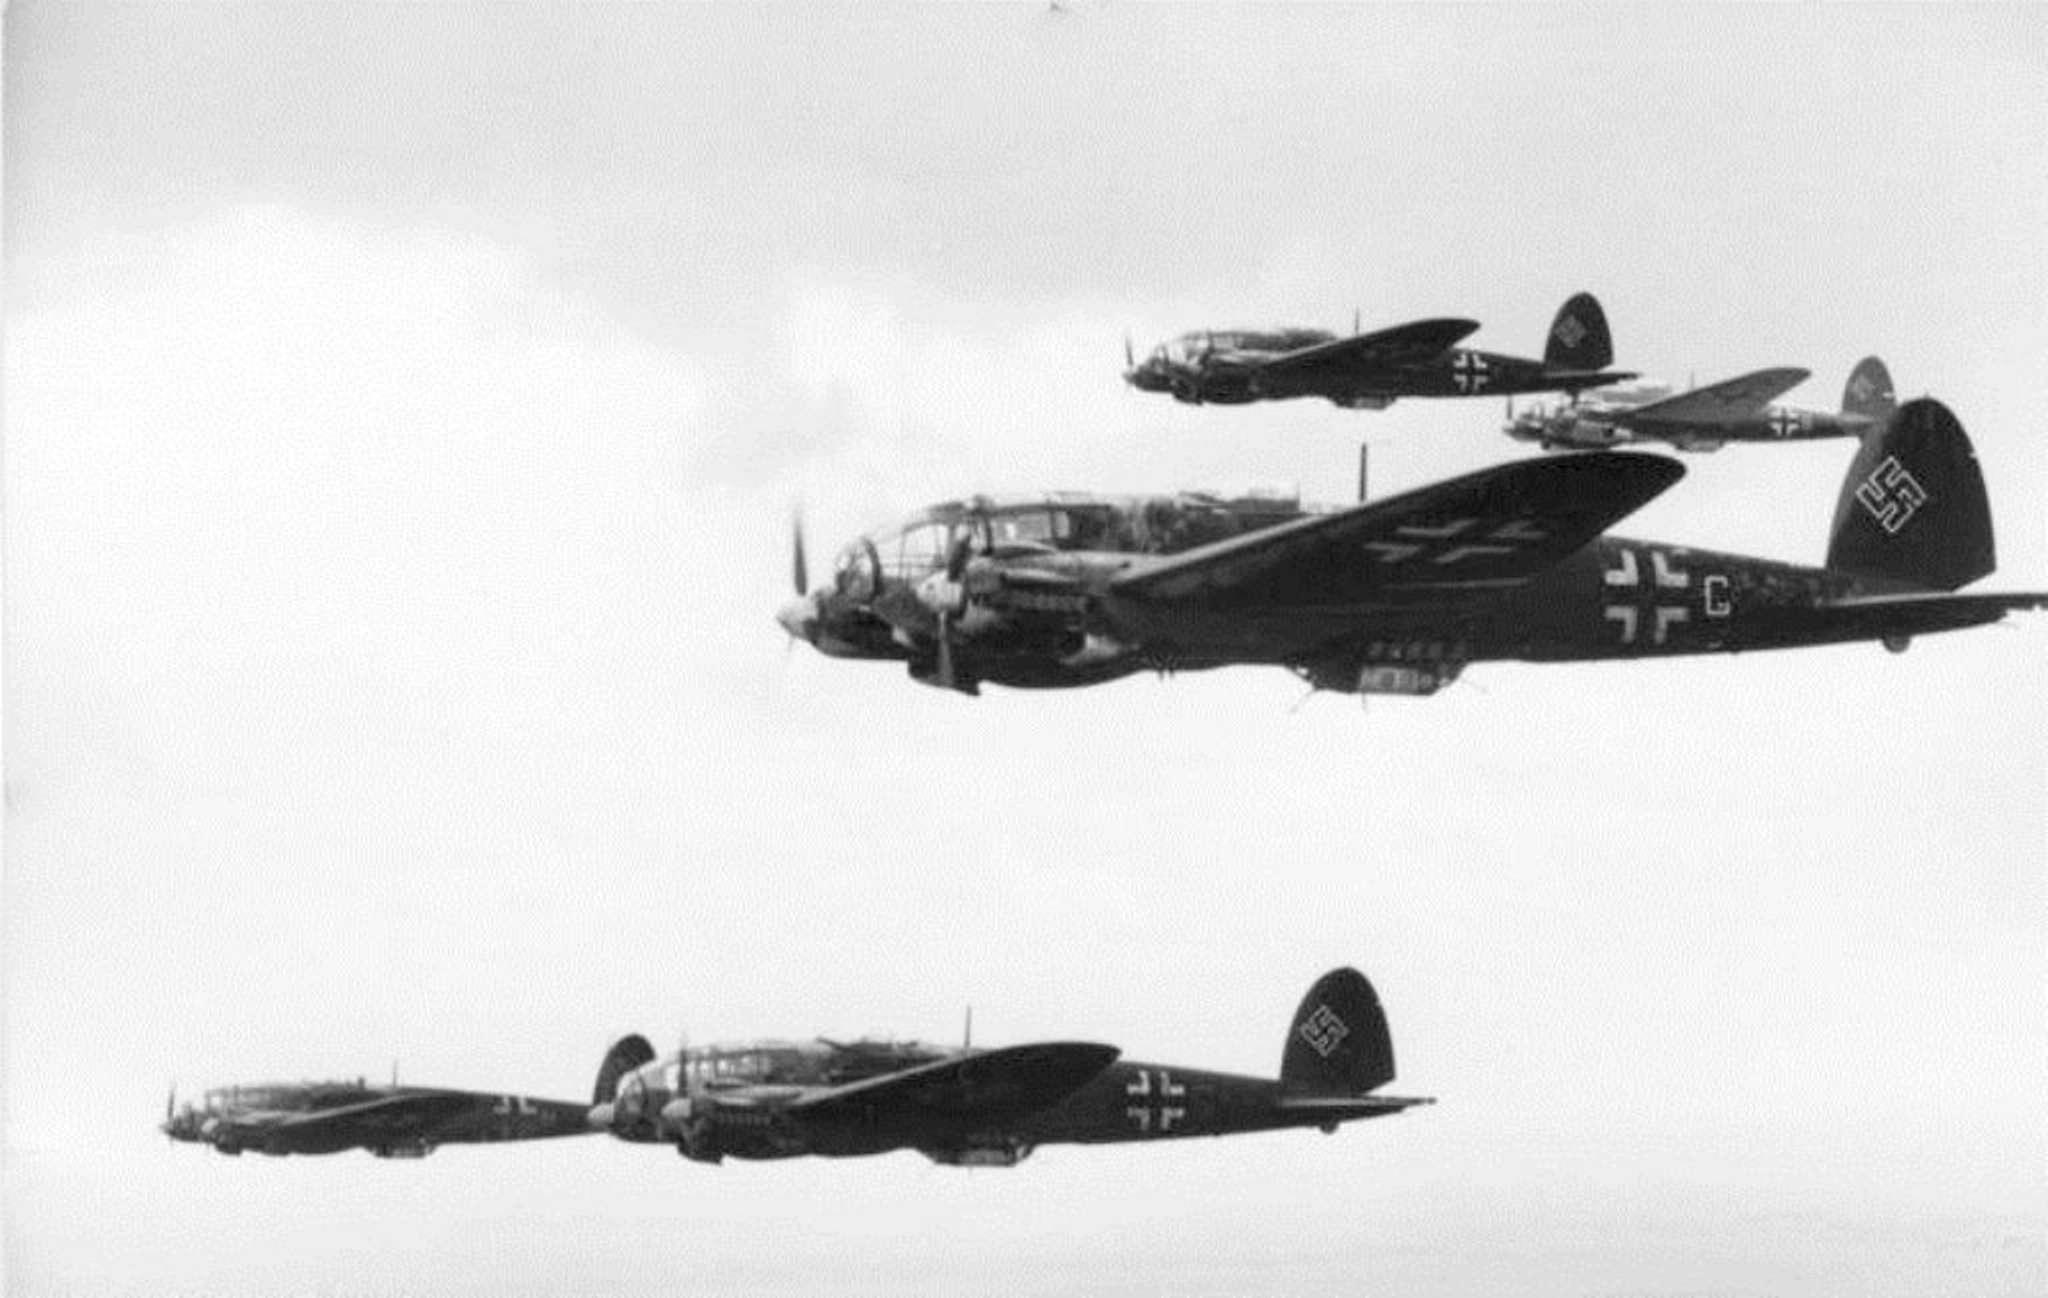 Heinkel He 111 planes in formation.